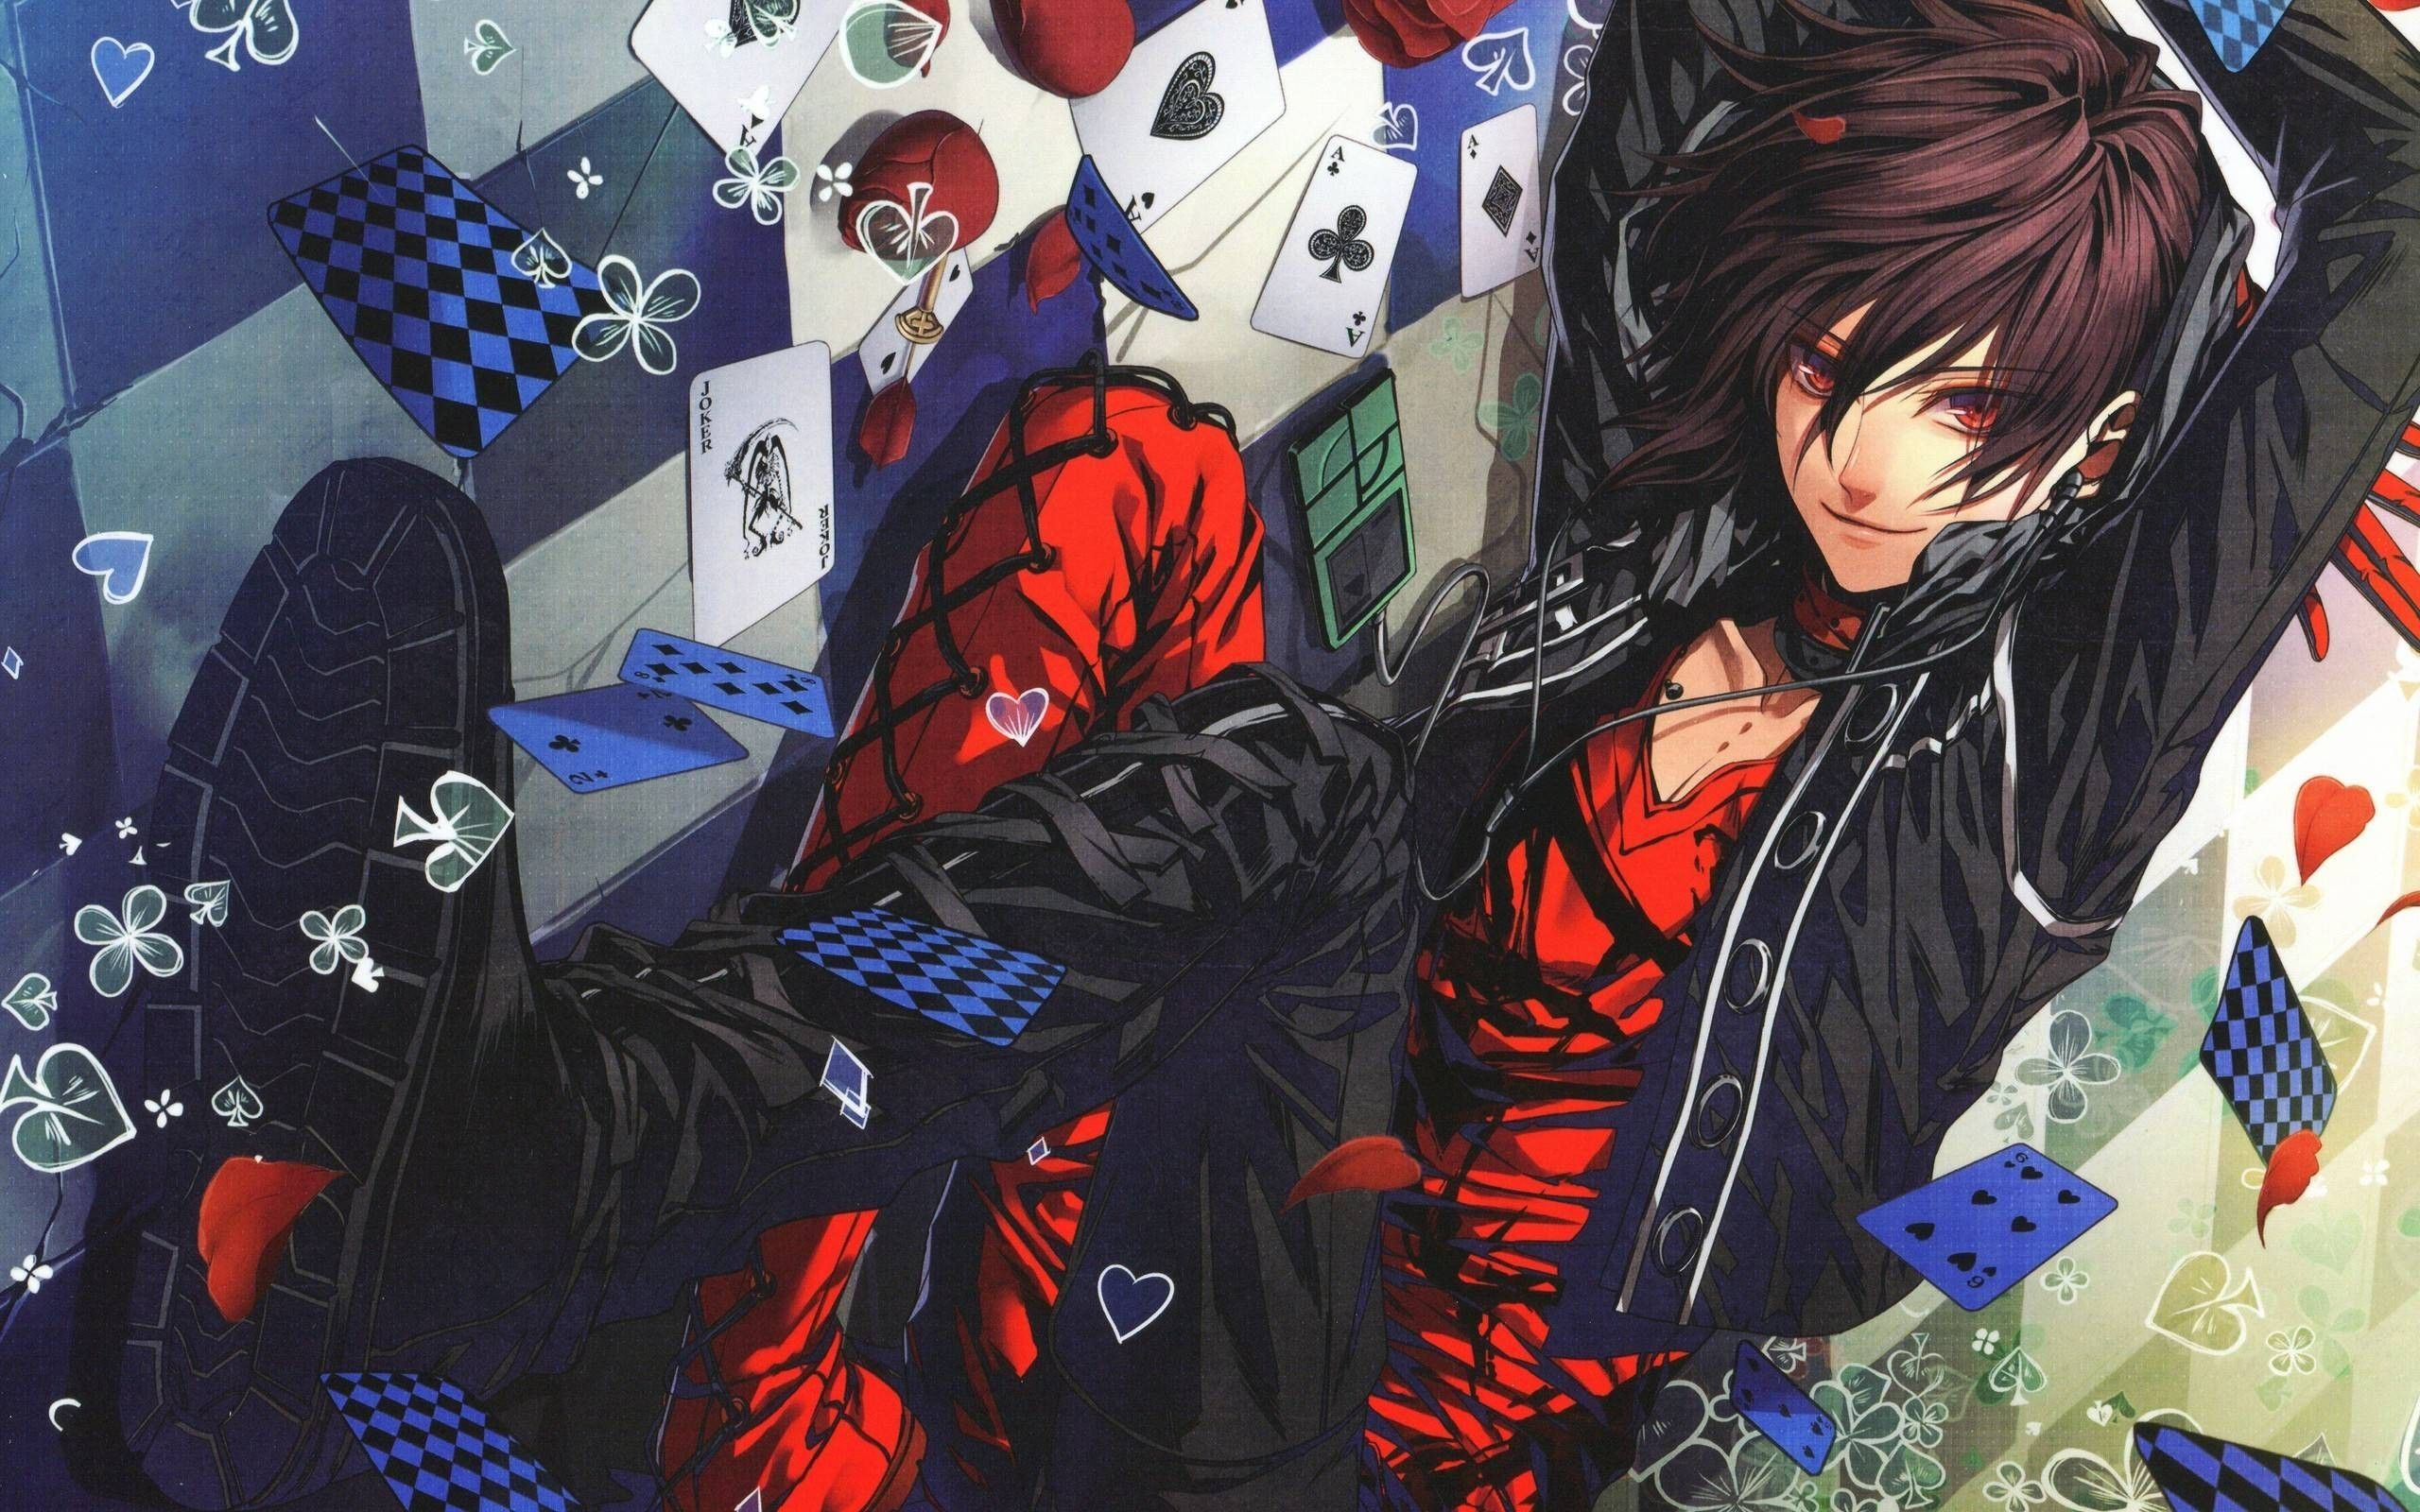 Anime Boys Wallpaper Hd Pesquisa Google Cute Anime Guys Cute Anime Boy Anime Glasses Boy Anime gamer boy wallpaper